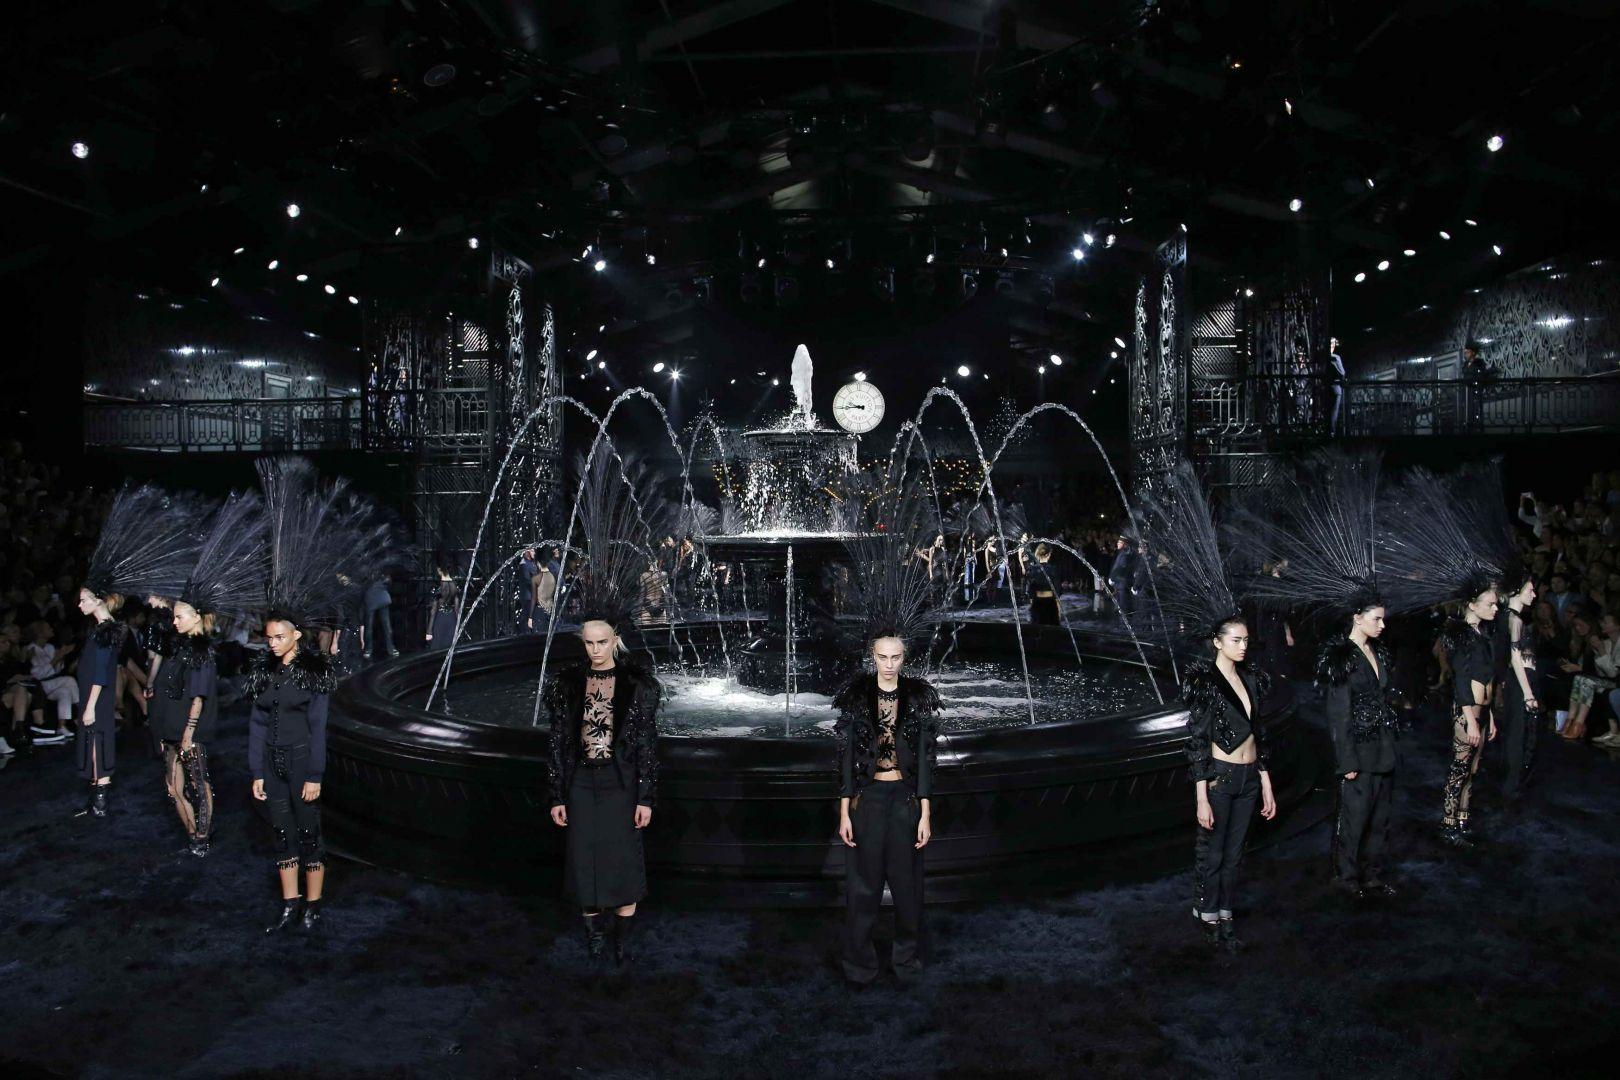 Mame Fashion Dictionary: Marc Jacobs Last Louis Vuitton Show